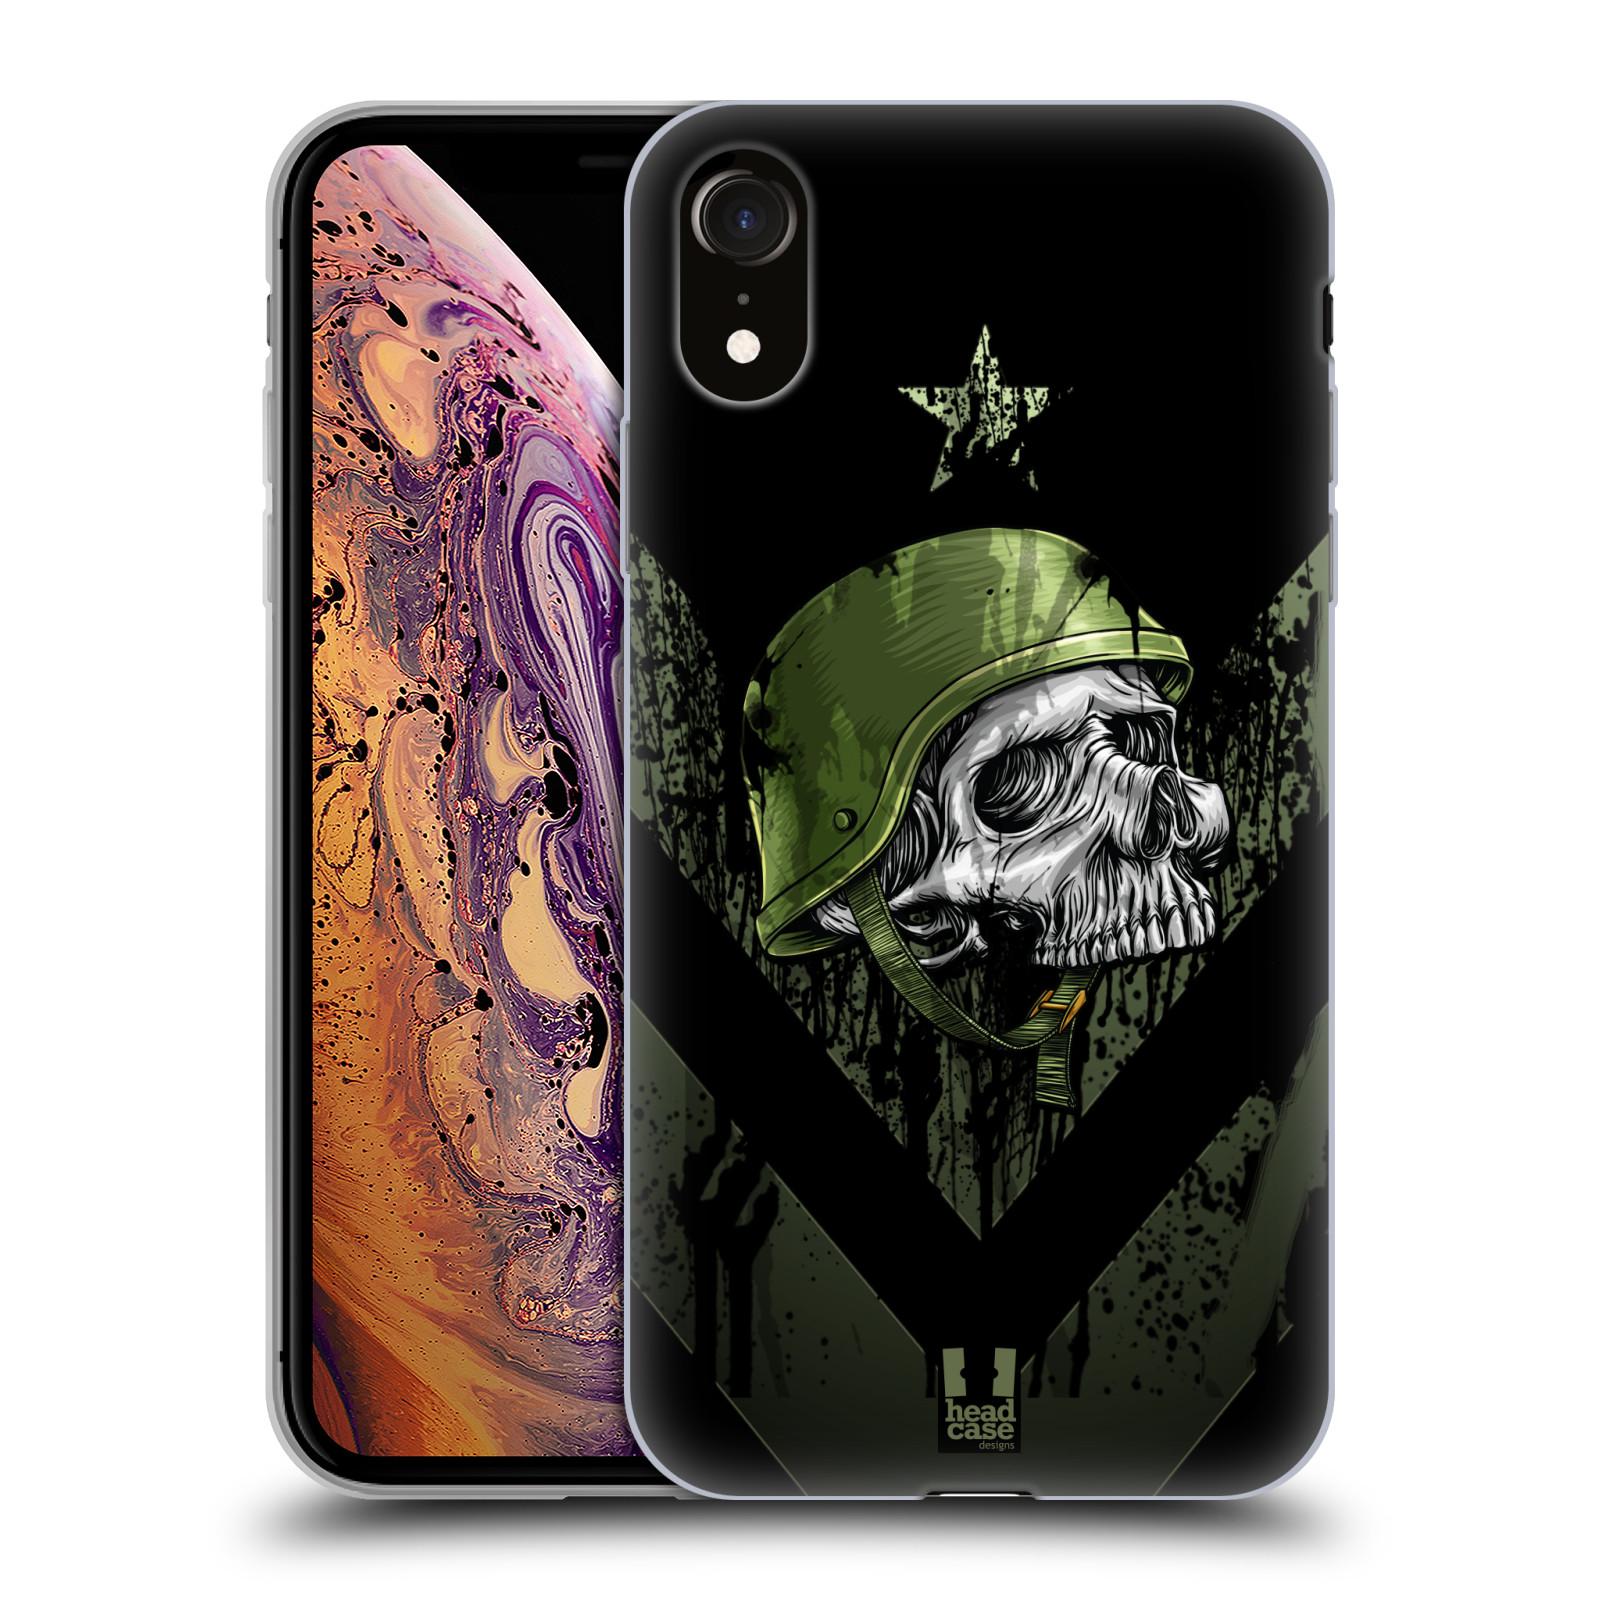 Silikonové pouzdro na mobil Apple iPhone XR - Head Case - LEBKA ONE MAN